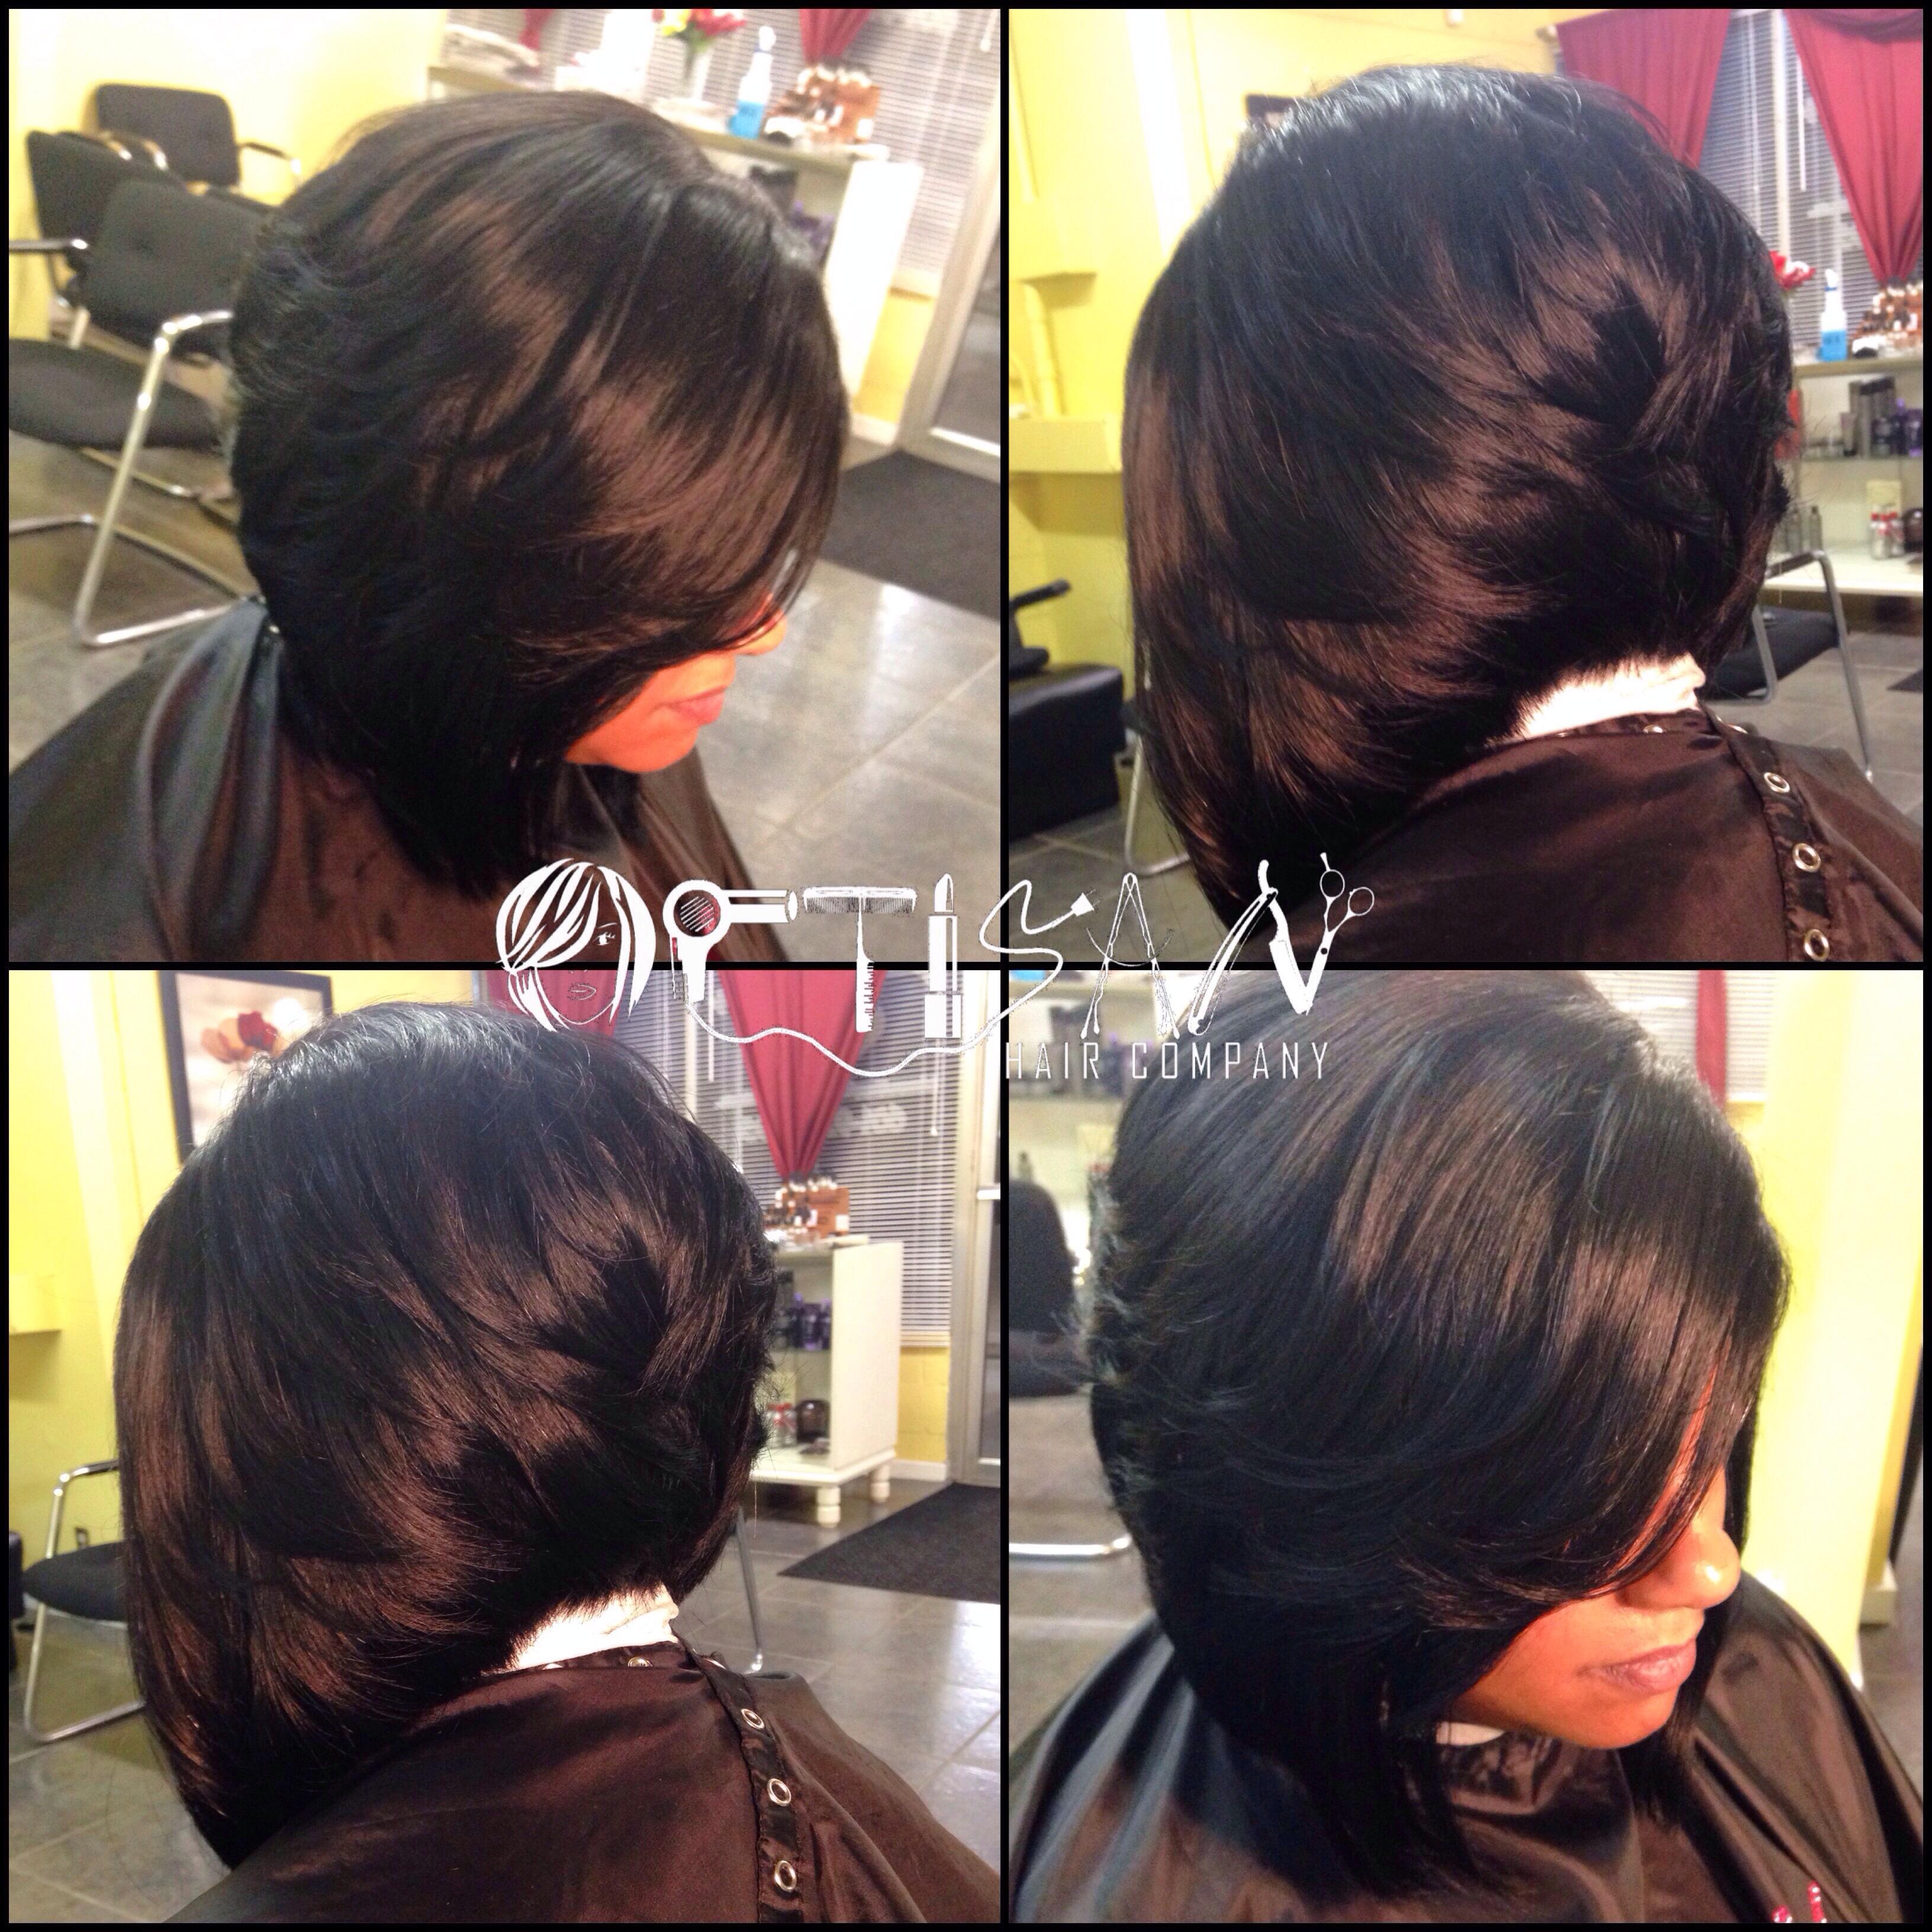 Lace closure Sew-in w/ bob cut   Artisan Hair Company, LLC